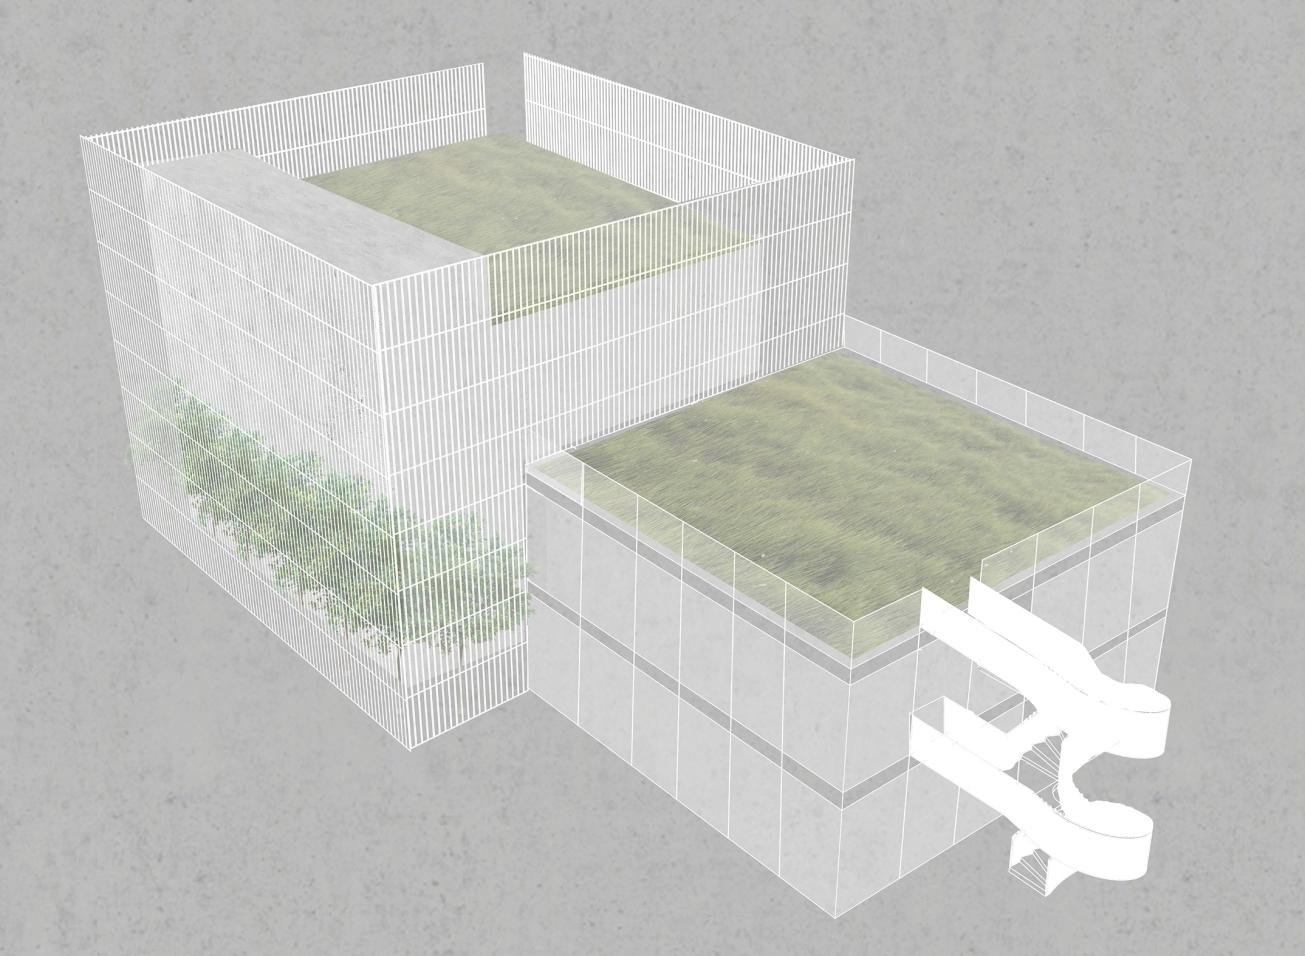 6_elzbieta-komendacka_wroclaw-univeristy-of-technology_architecture_master